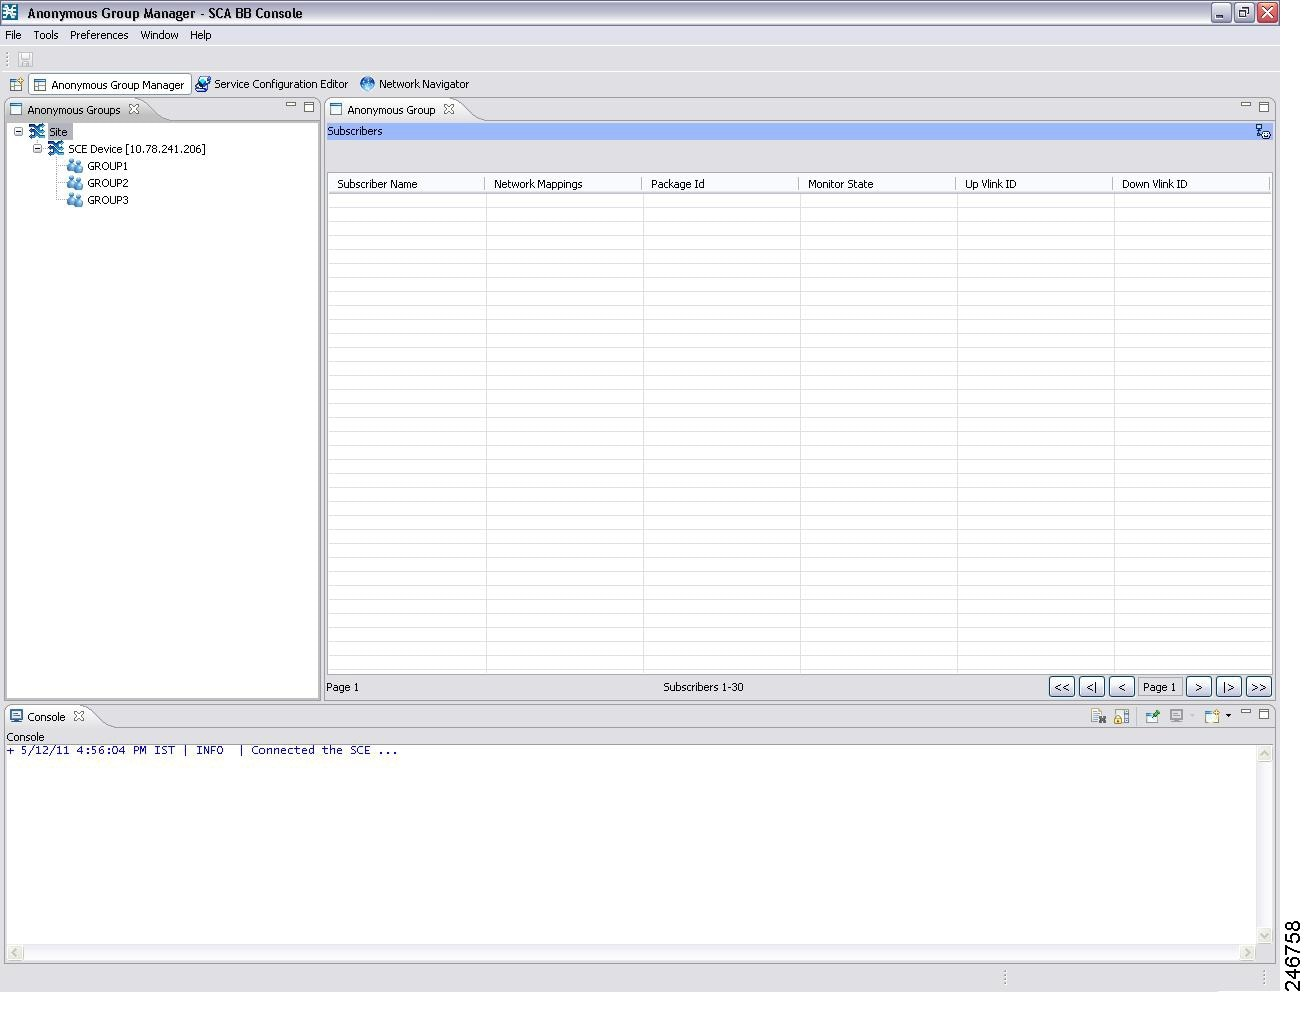 Cisco Service Control Application for Broadband User Guide, Release